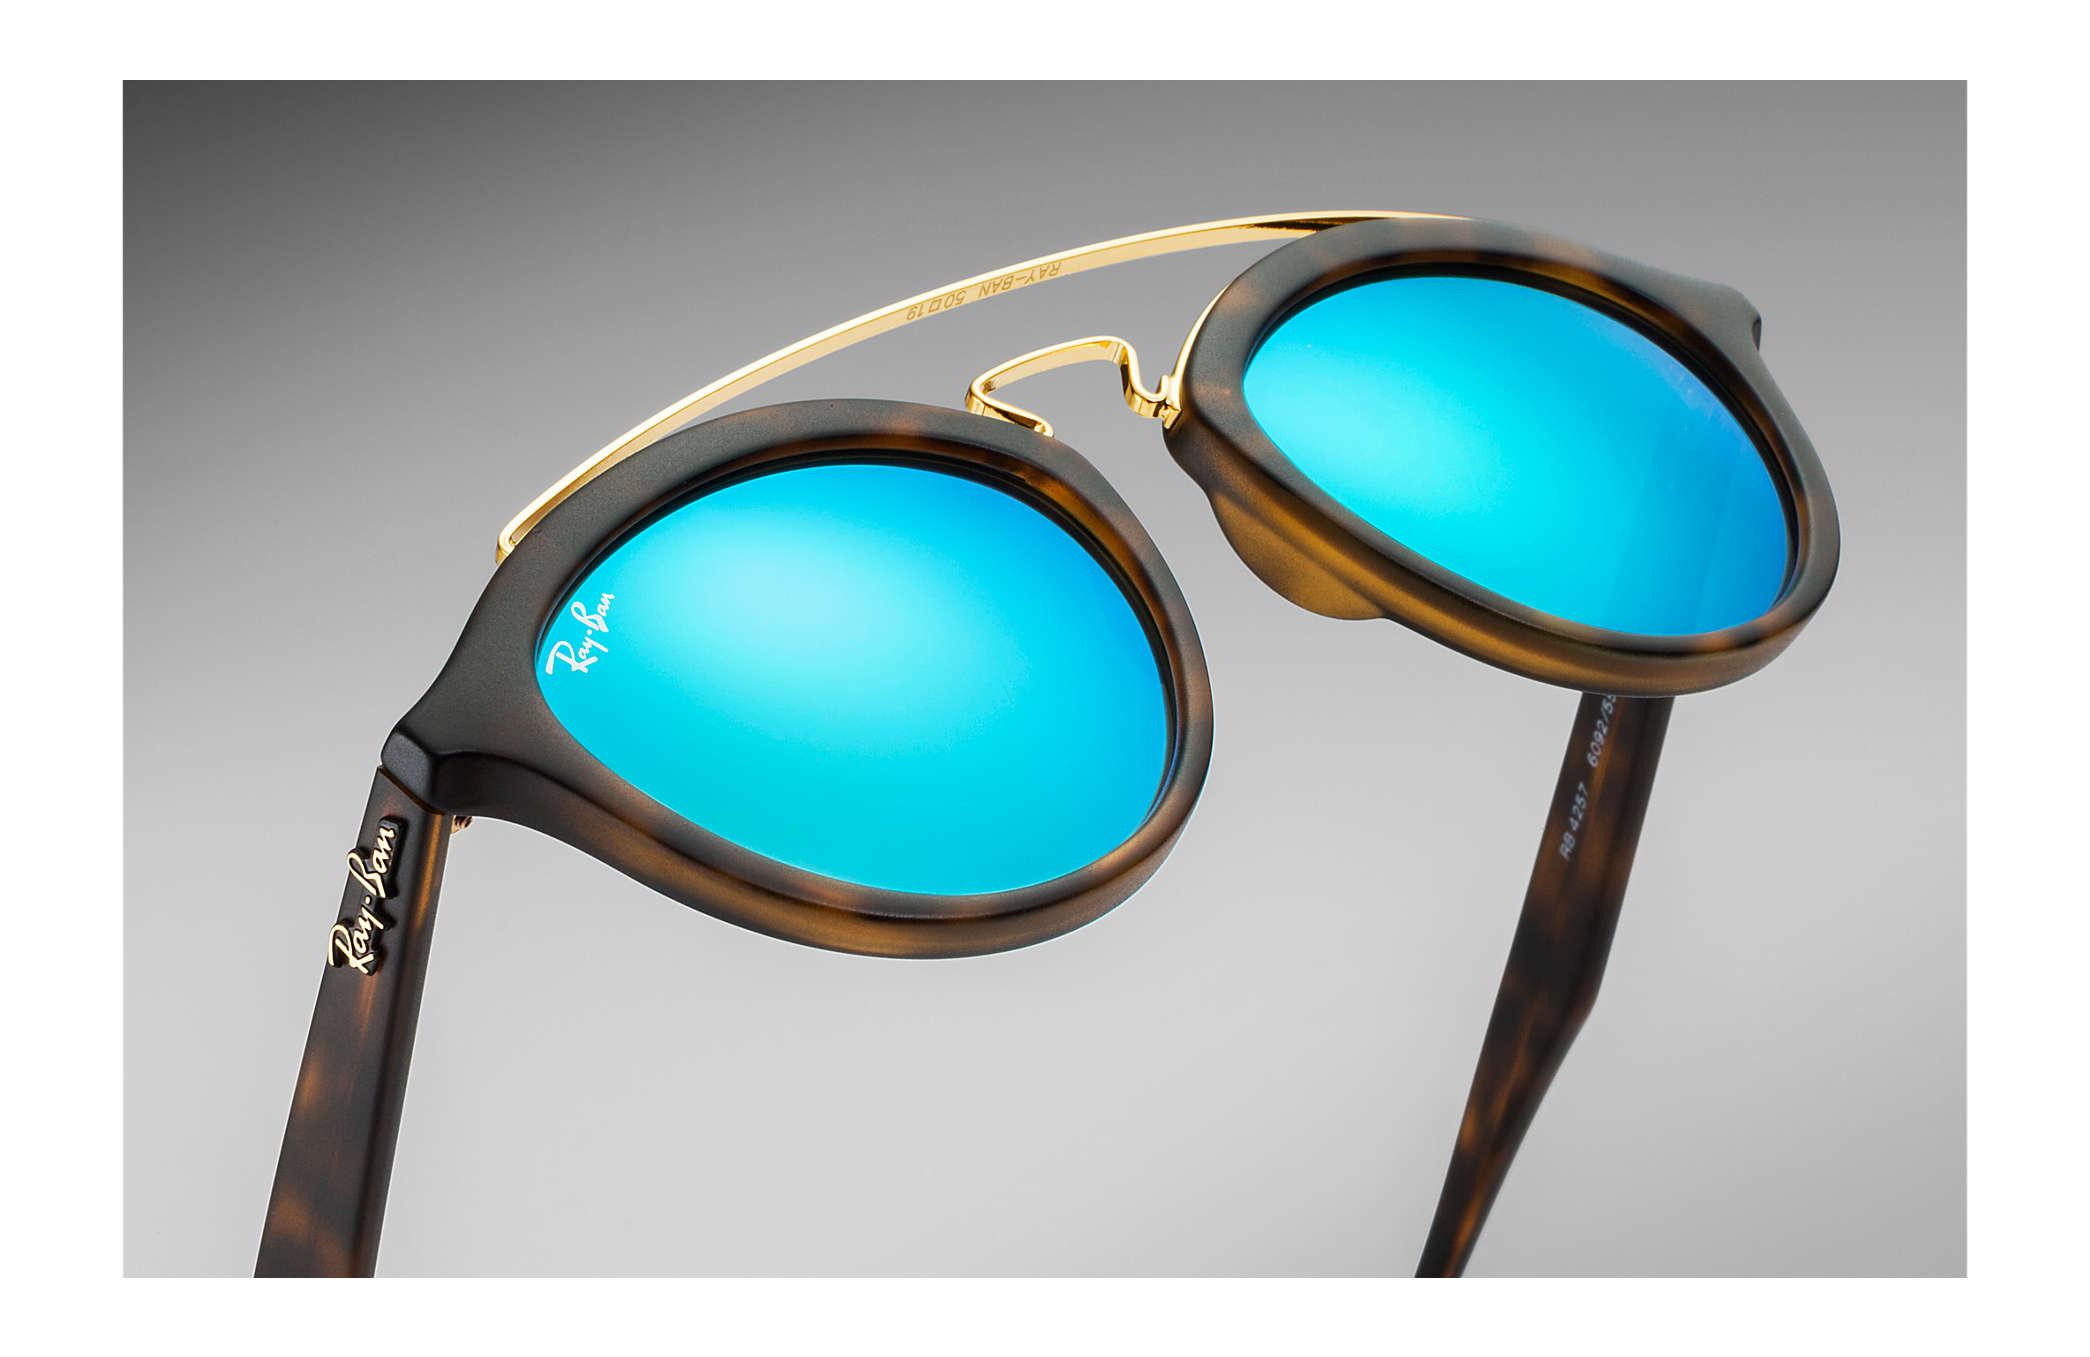 efc527ab0 Ray-Ban Rb4257 Gatsby Ii RB4257 Tortoise - Propionate - Blue Lenses ...